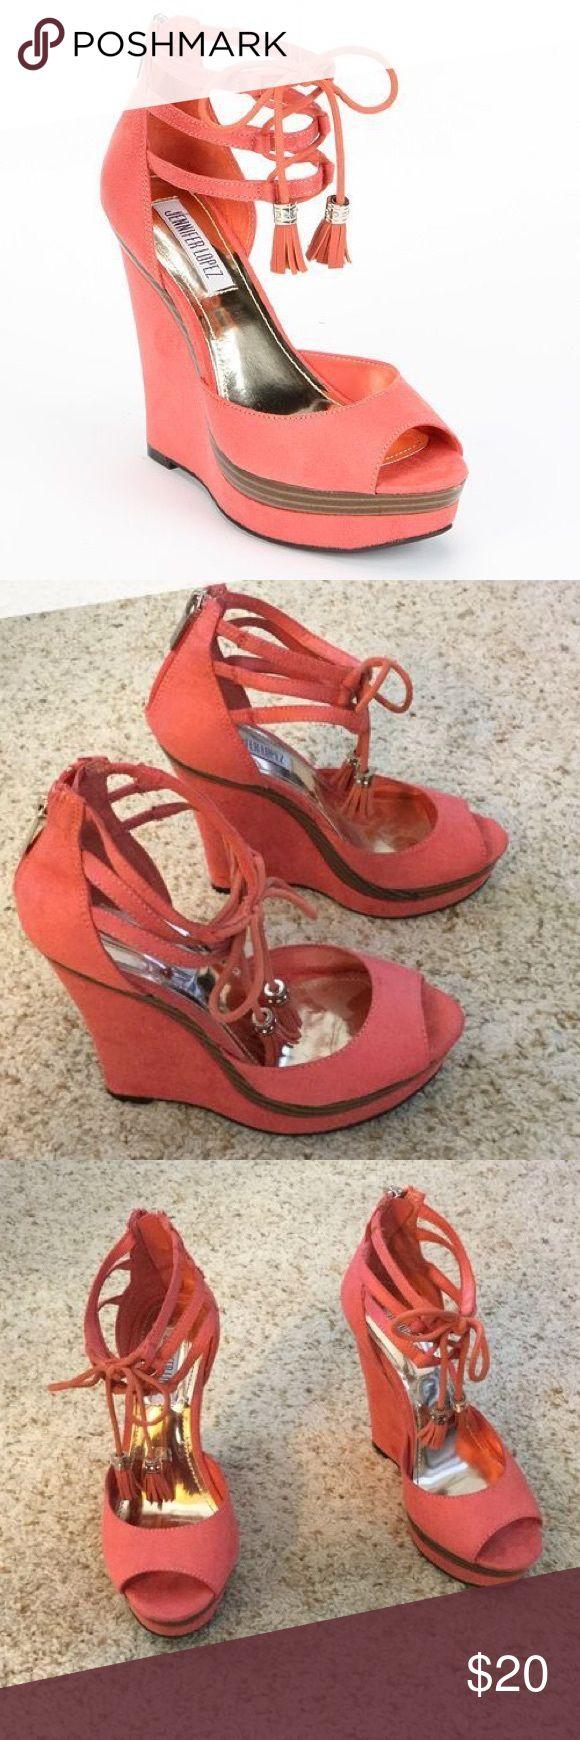 🌴 Jennifer Lopez Wedge High Heels 🌴 Jennifer Lopez Wedge High Heels. Size 9 1/2. Orange - Peach color, suede material. Good condition. Lace up around ankles. Jennifer Lopez Shoes Heels